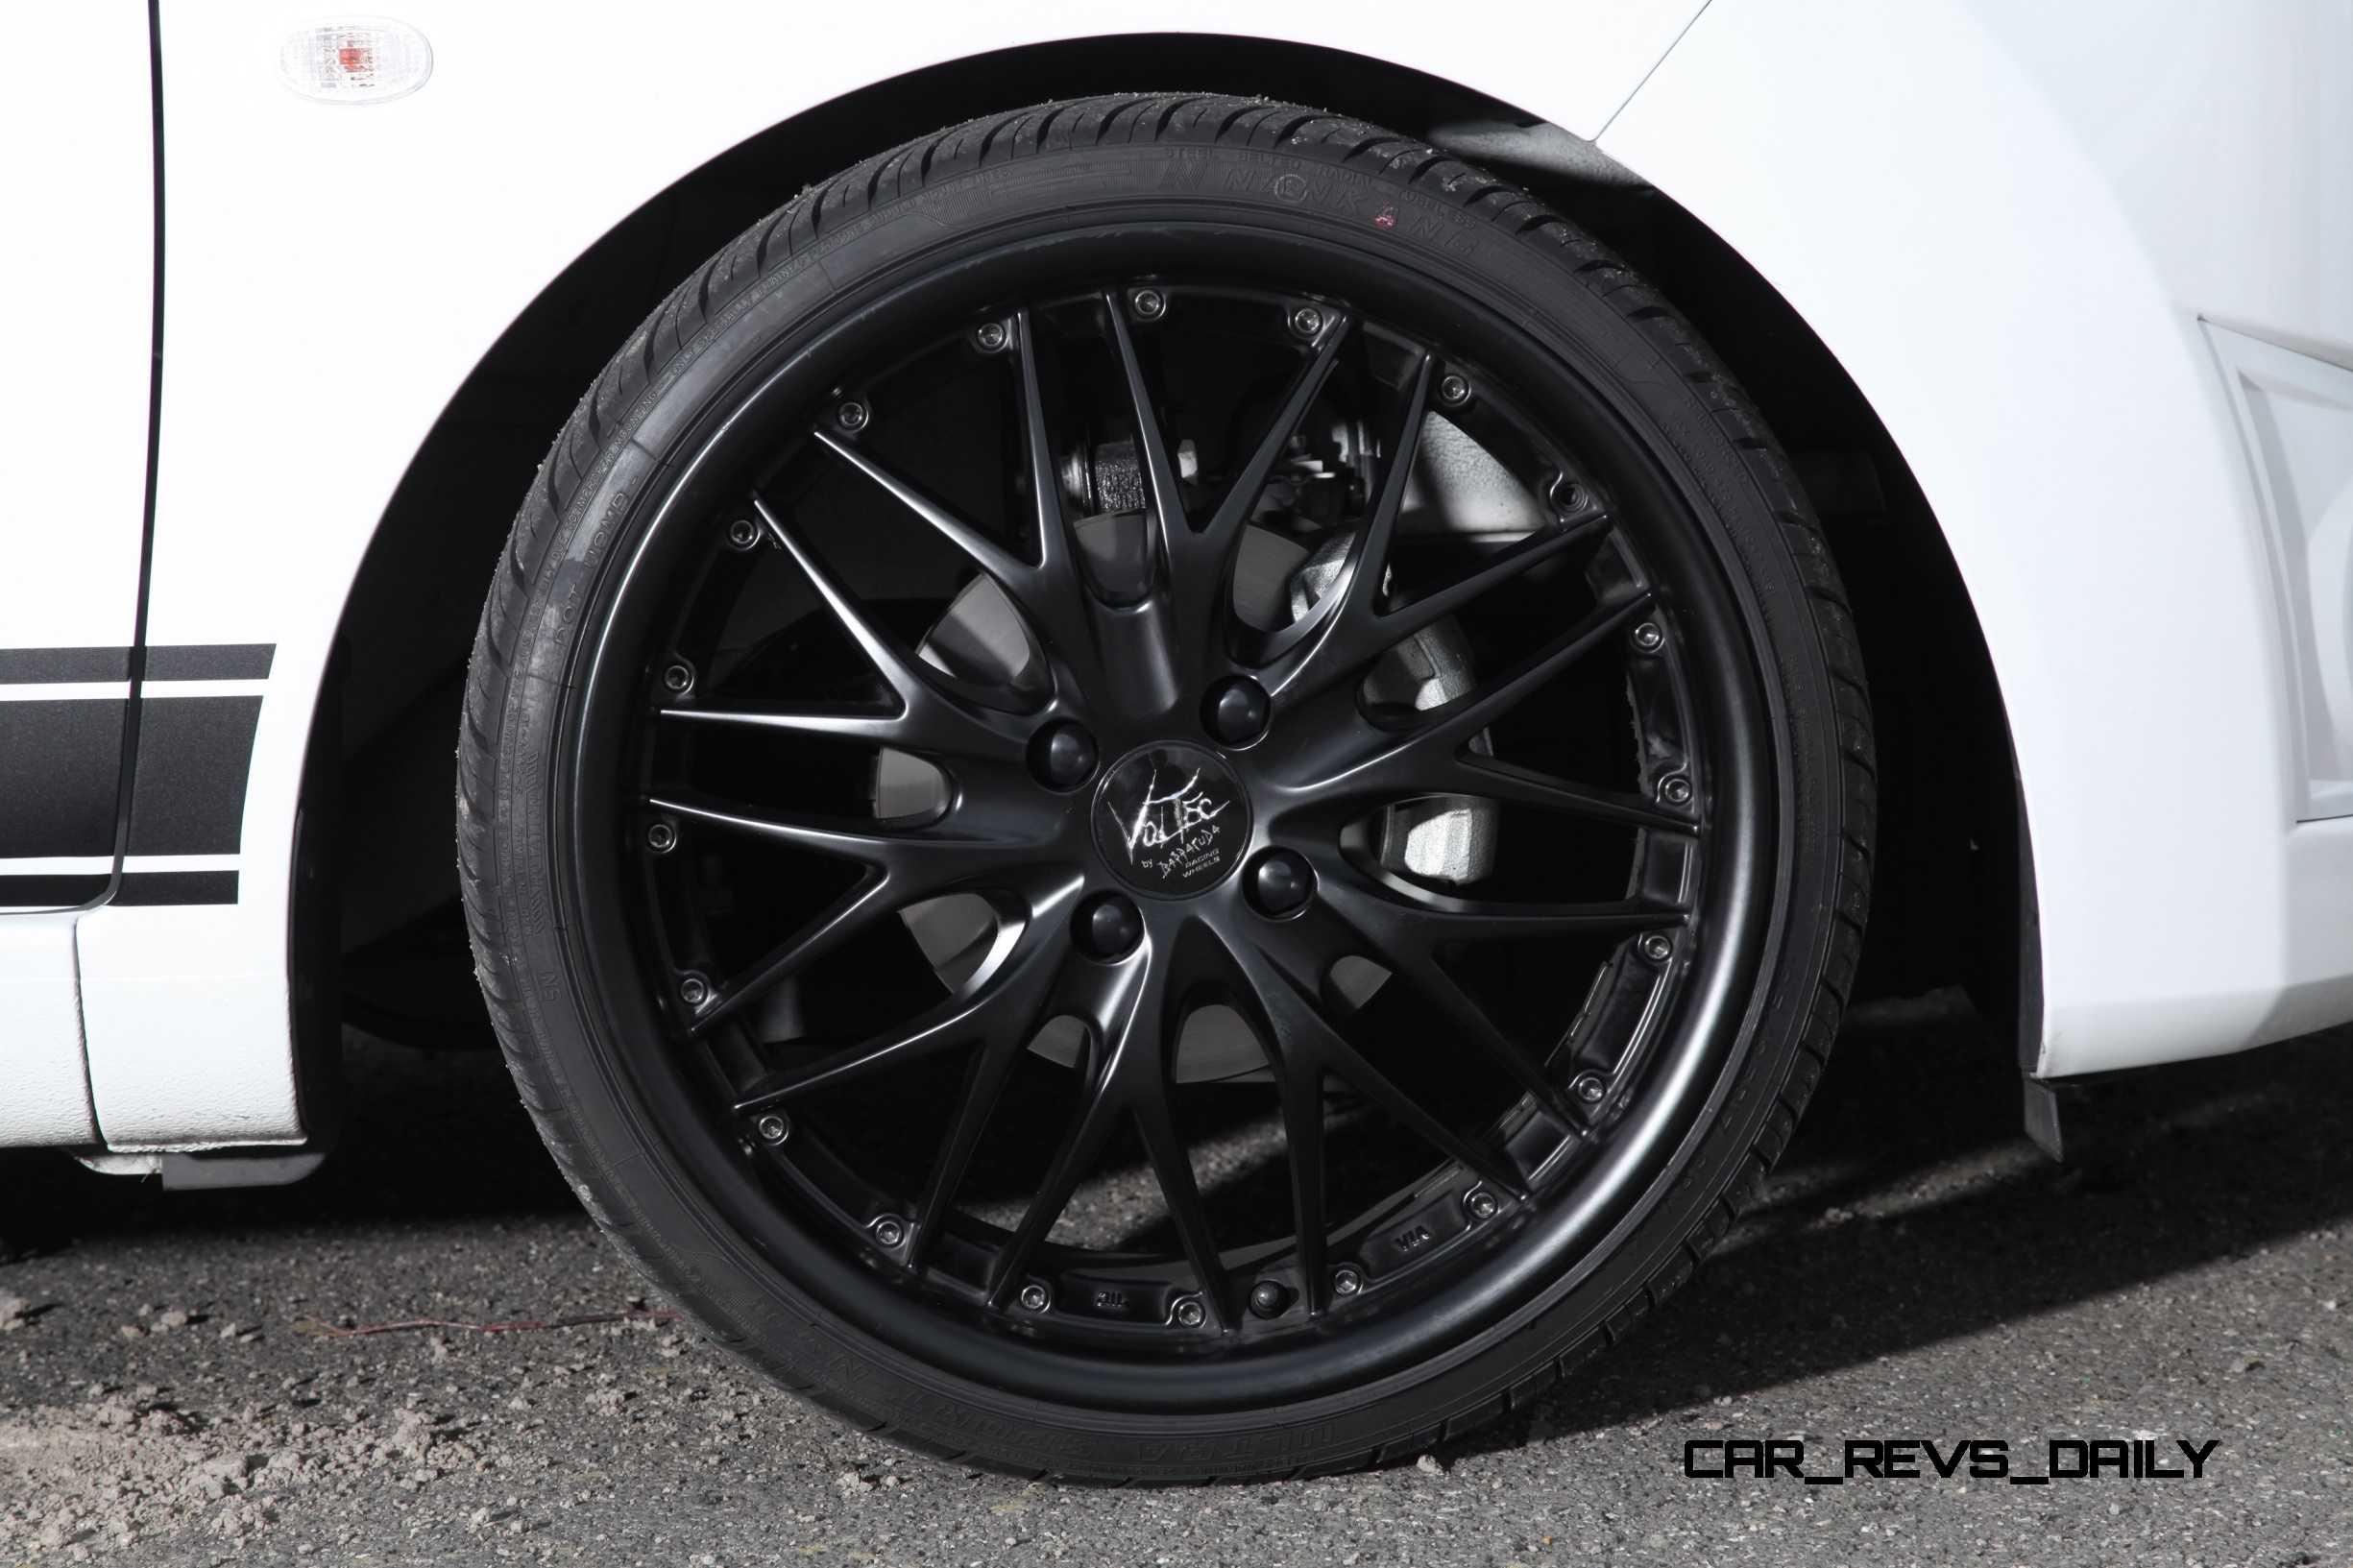 Tuner Showcase - Chevrolet Spark by KBR Motorsport